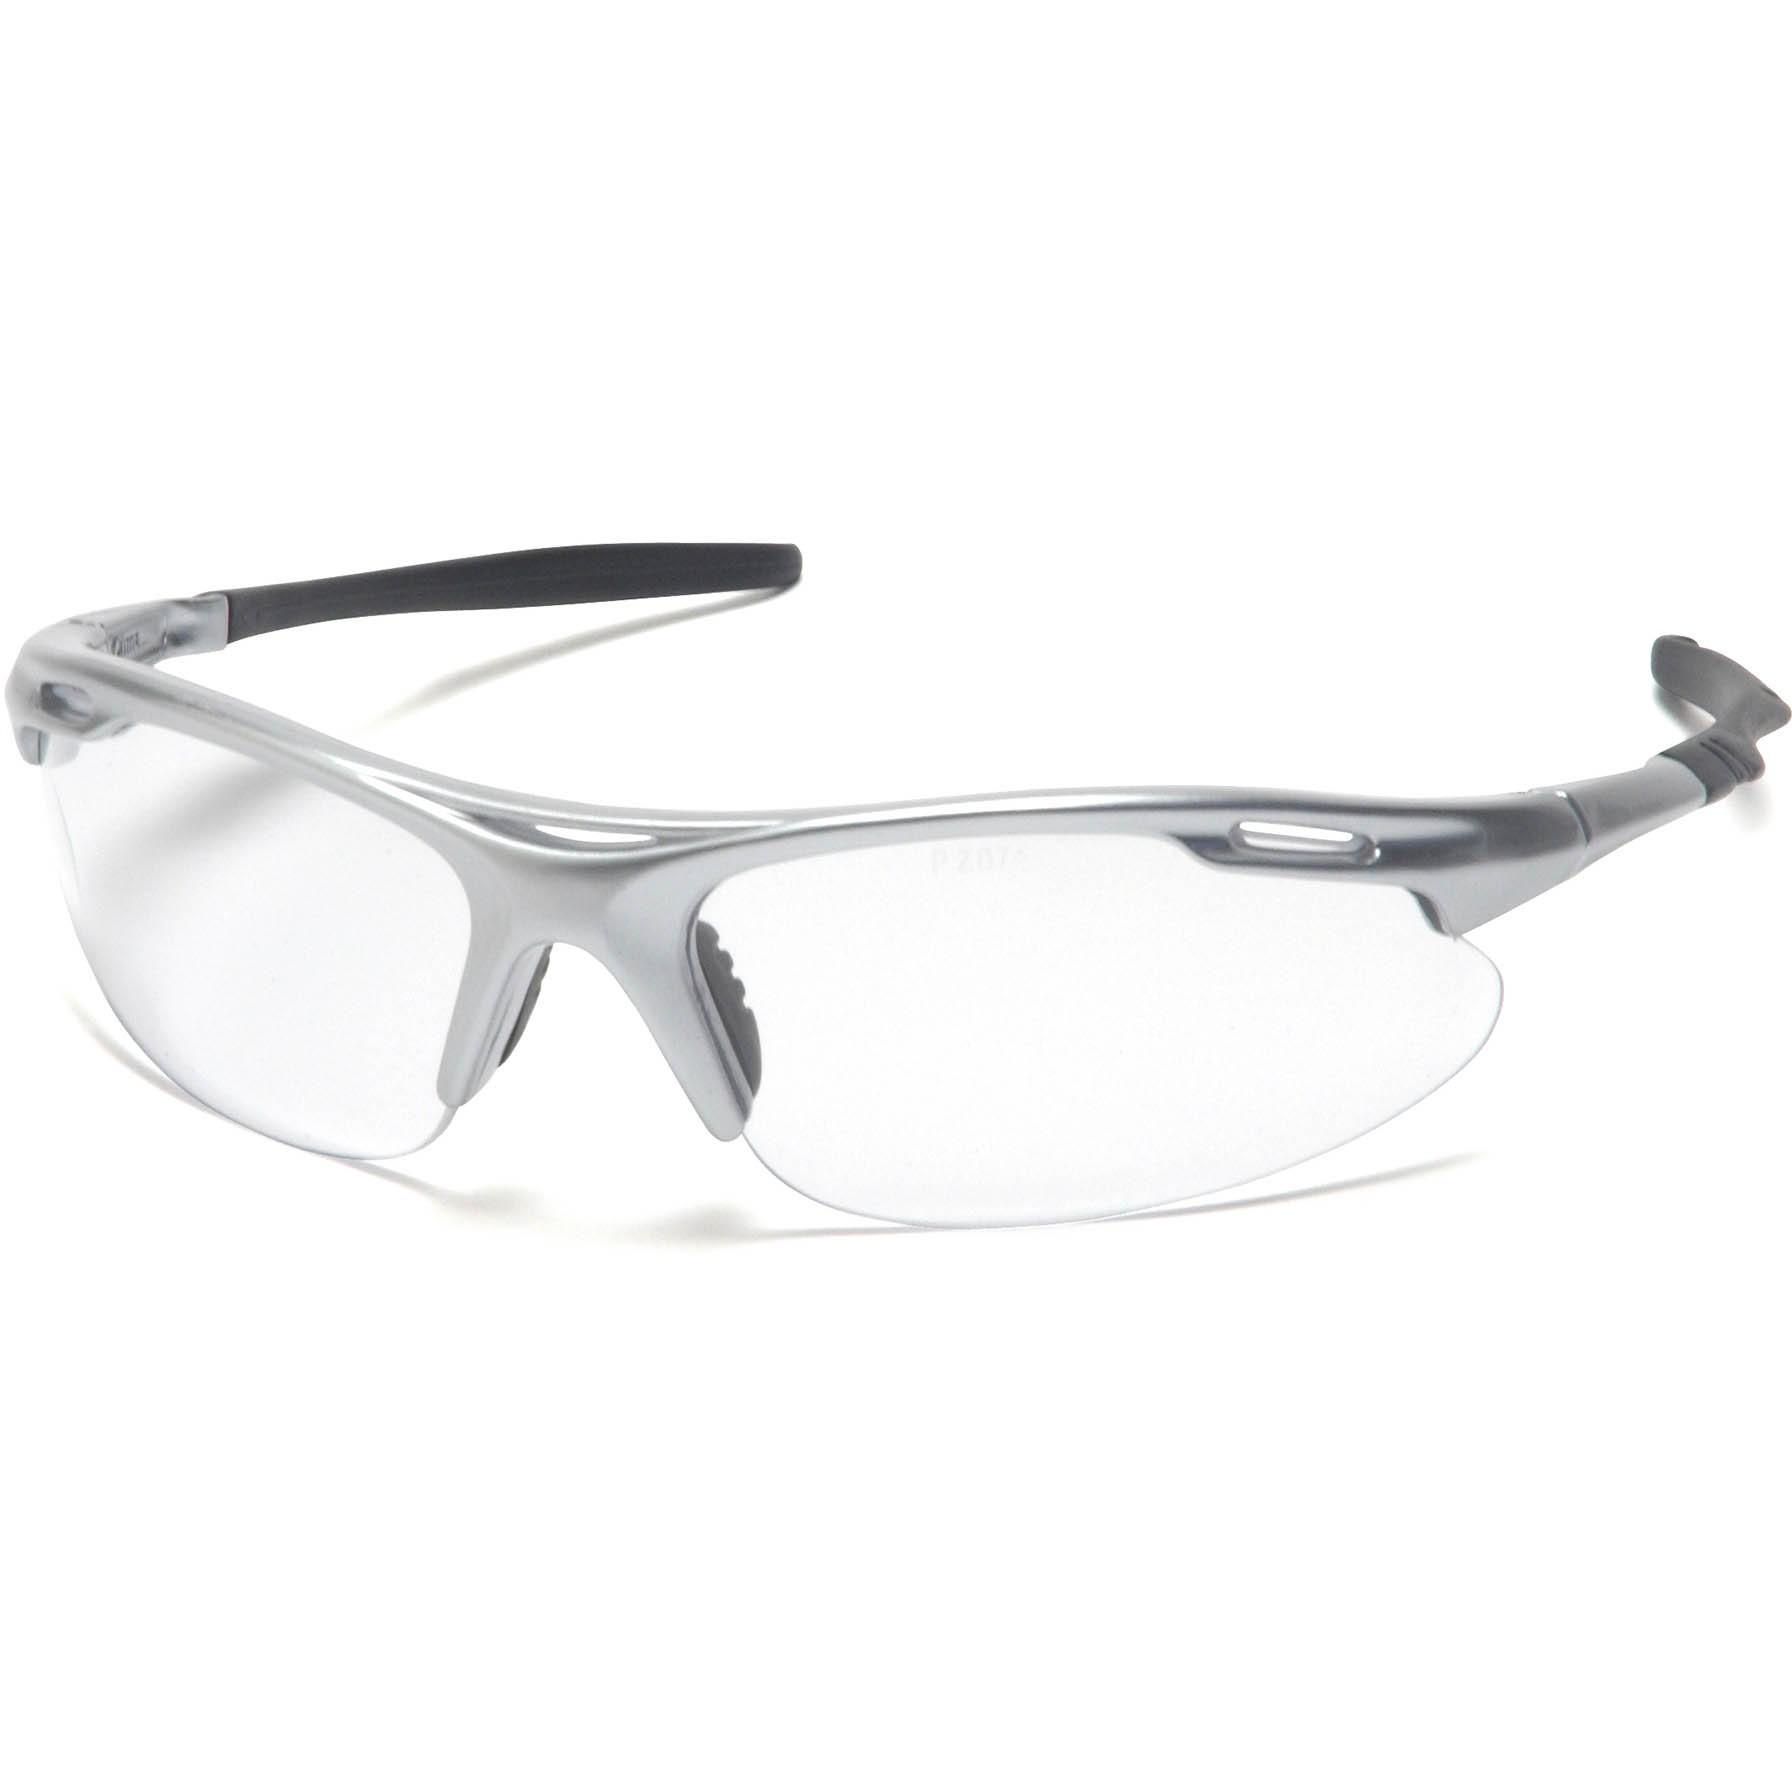 Pyramex® Avante® Safety Glasses, Gunmetal Frame, Clear Lens